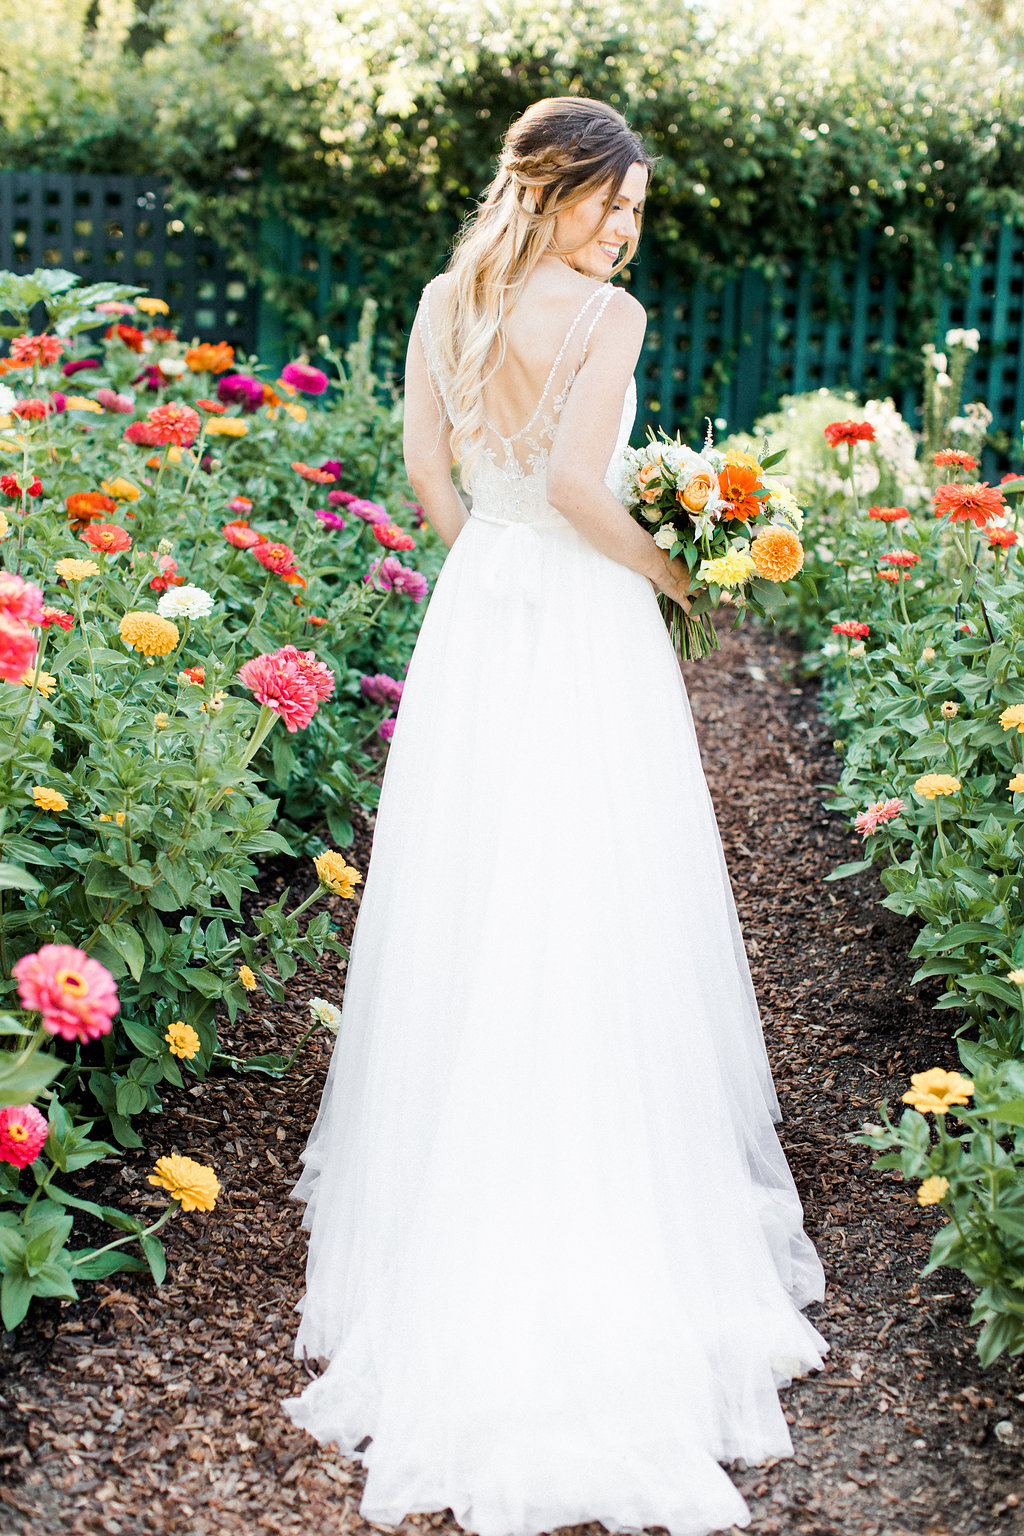 spring wedding dresses - photo by Erin Milnik http://ruffledblog.com/colorful-monday-afternoon-garden-elopement